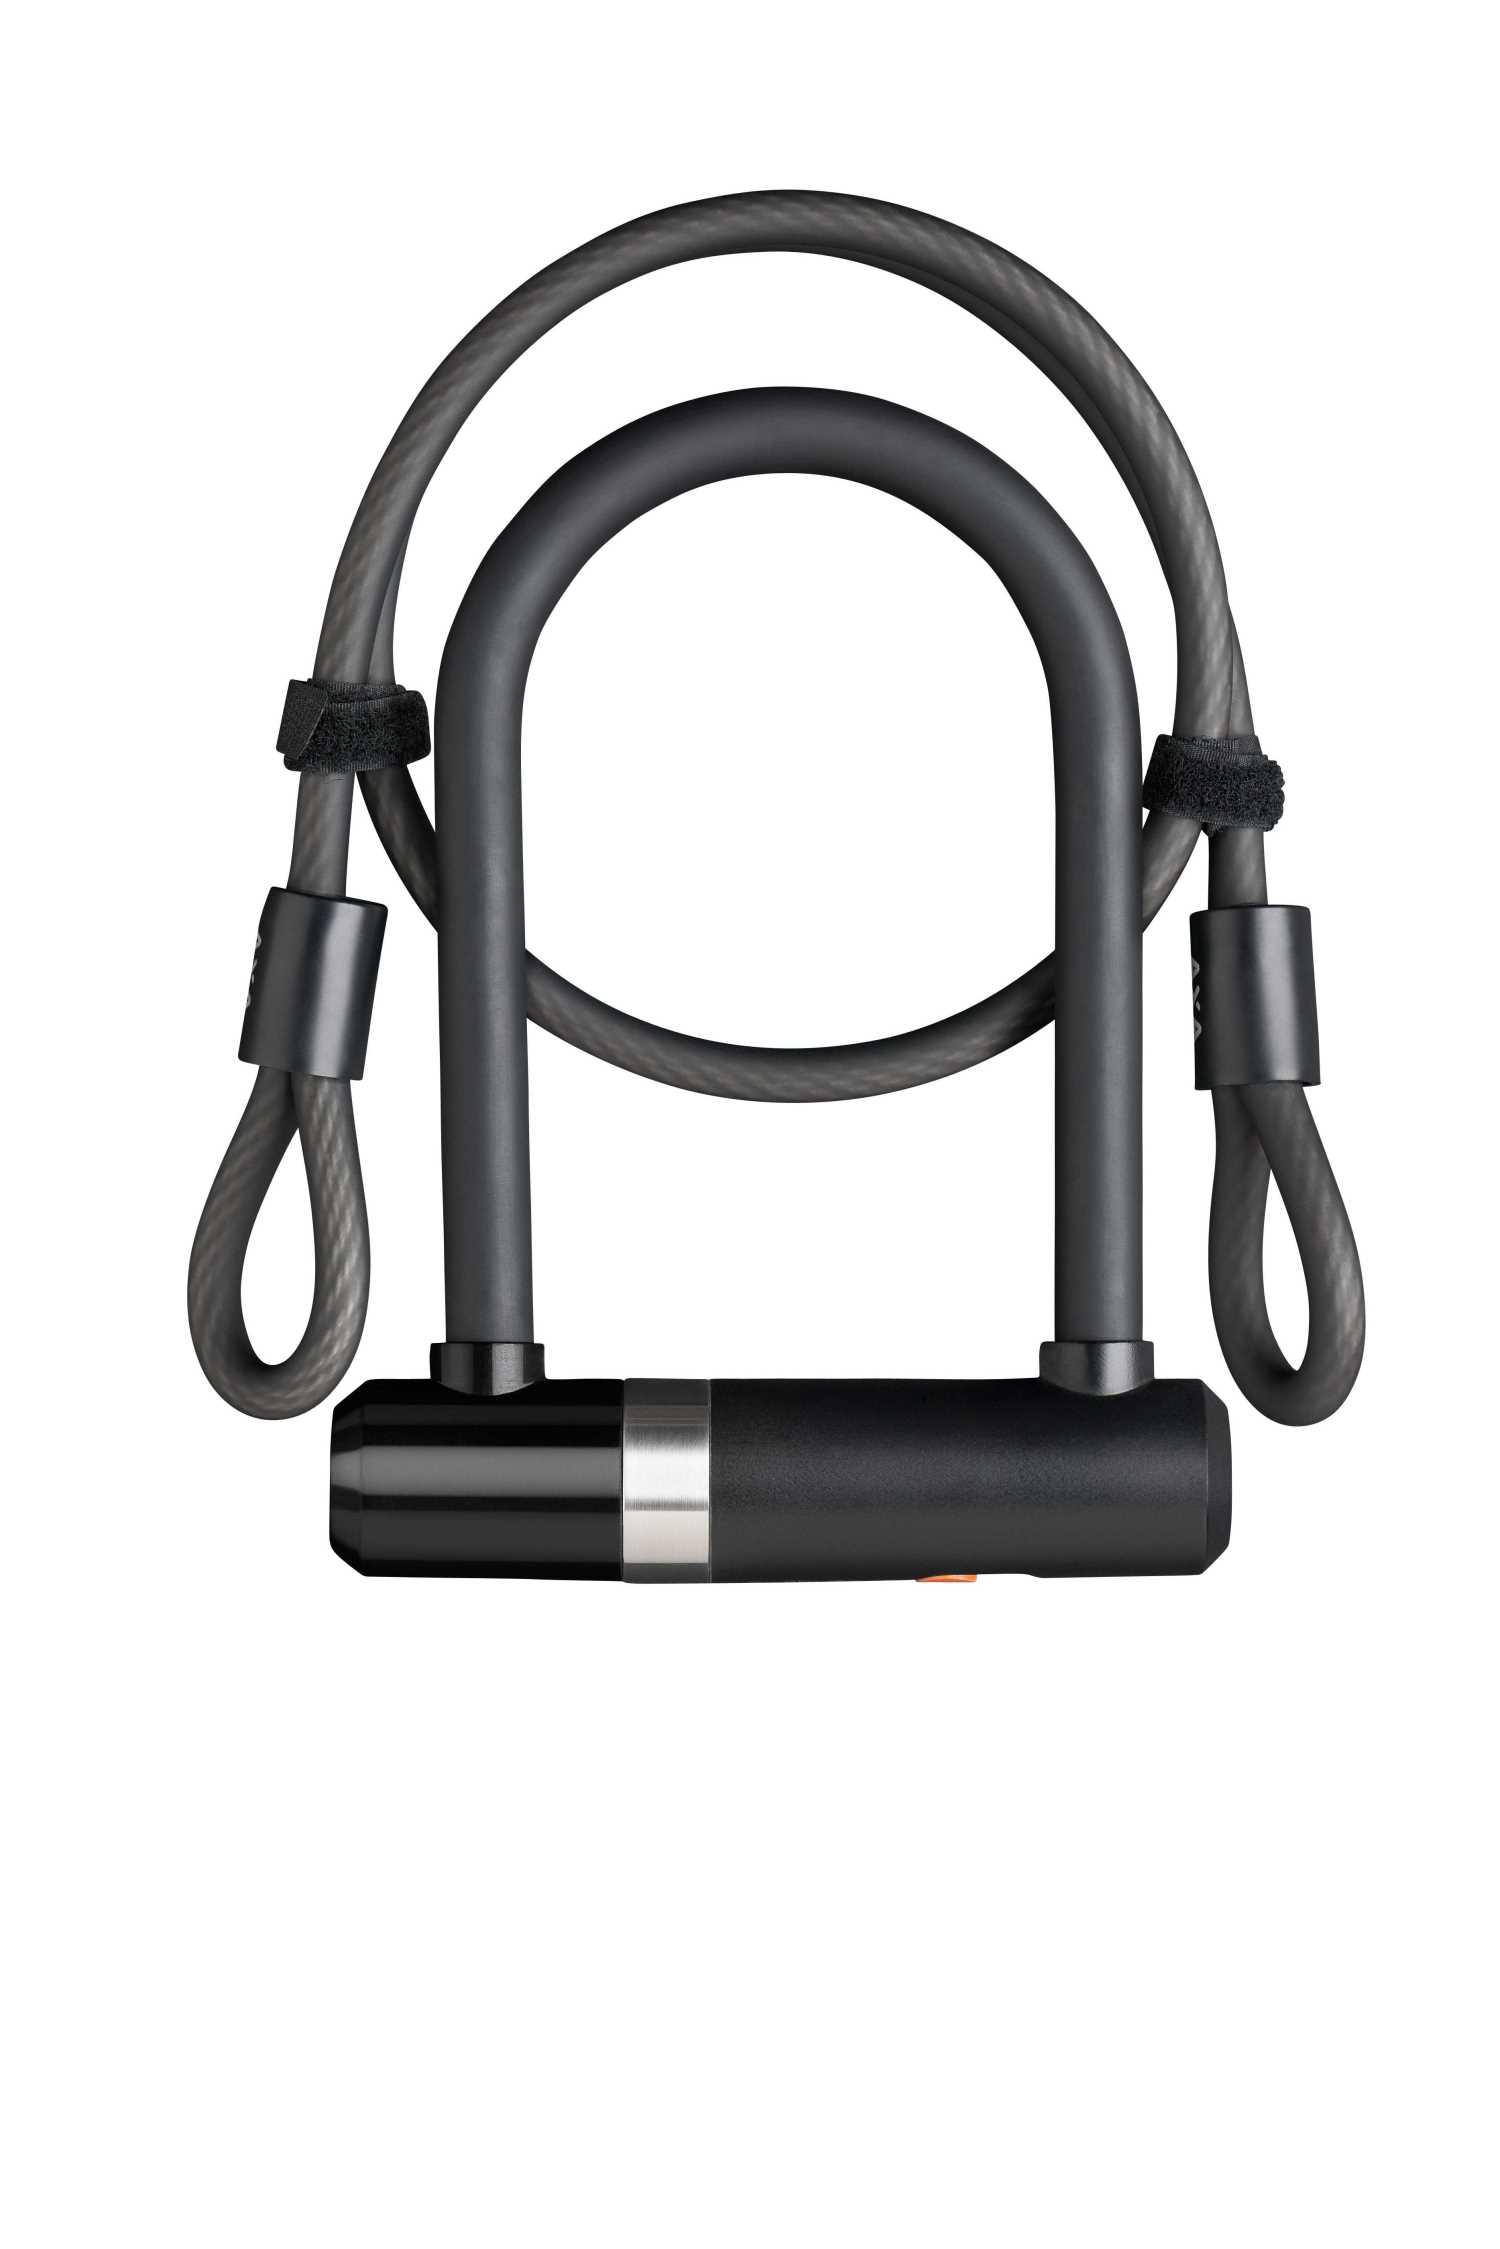 AXA Newton Pro Mini - Bøjlelås med 2 nøgler og LoopWire - Sort | Combo Lock